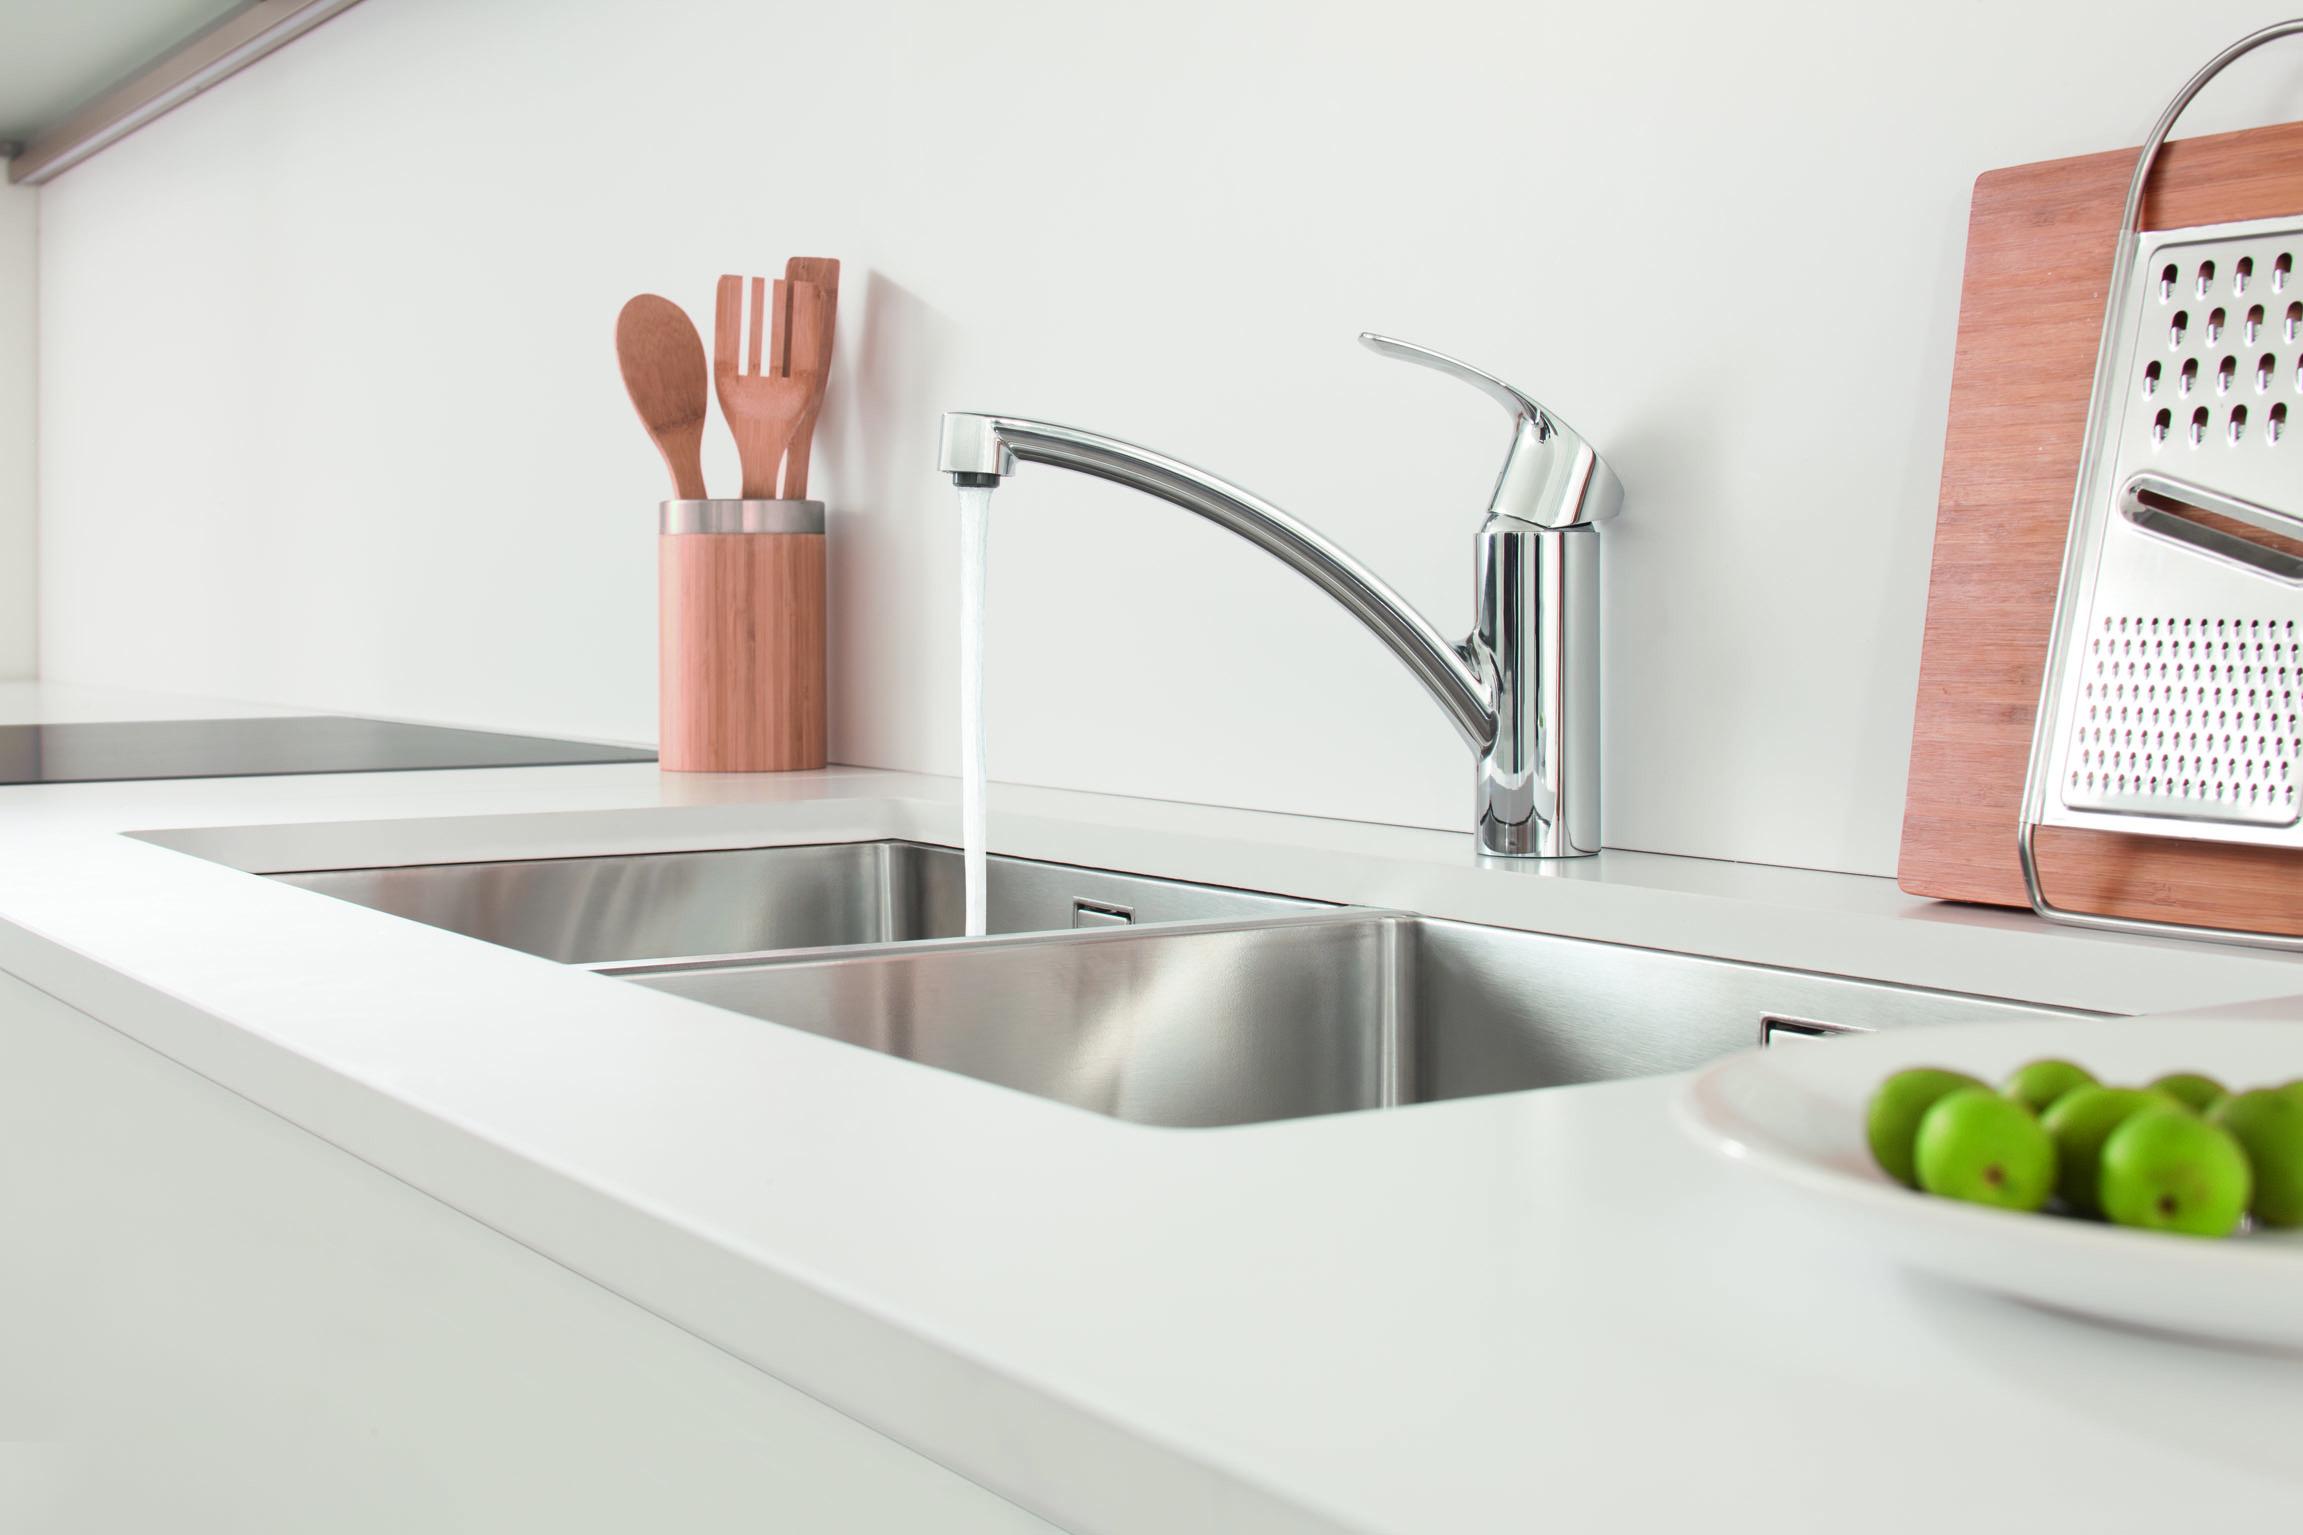 Torneiras – Living Kitchen 2015 #515724 2303x1535 Acessorios Banheiro Grohe